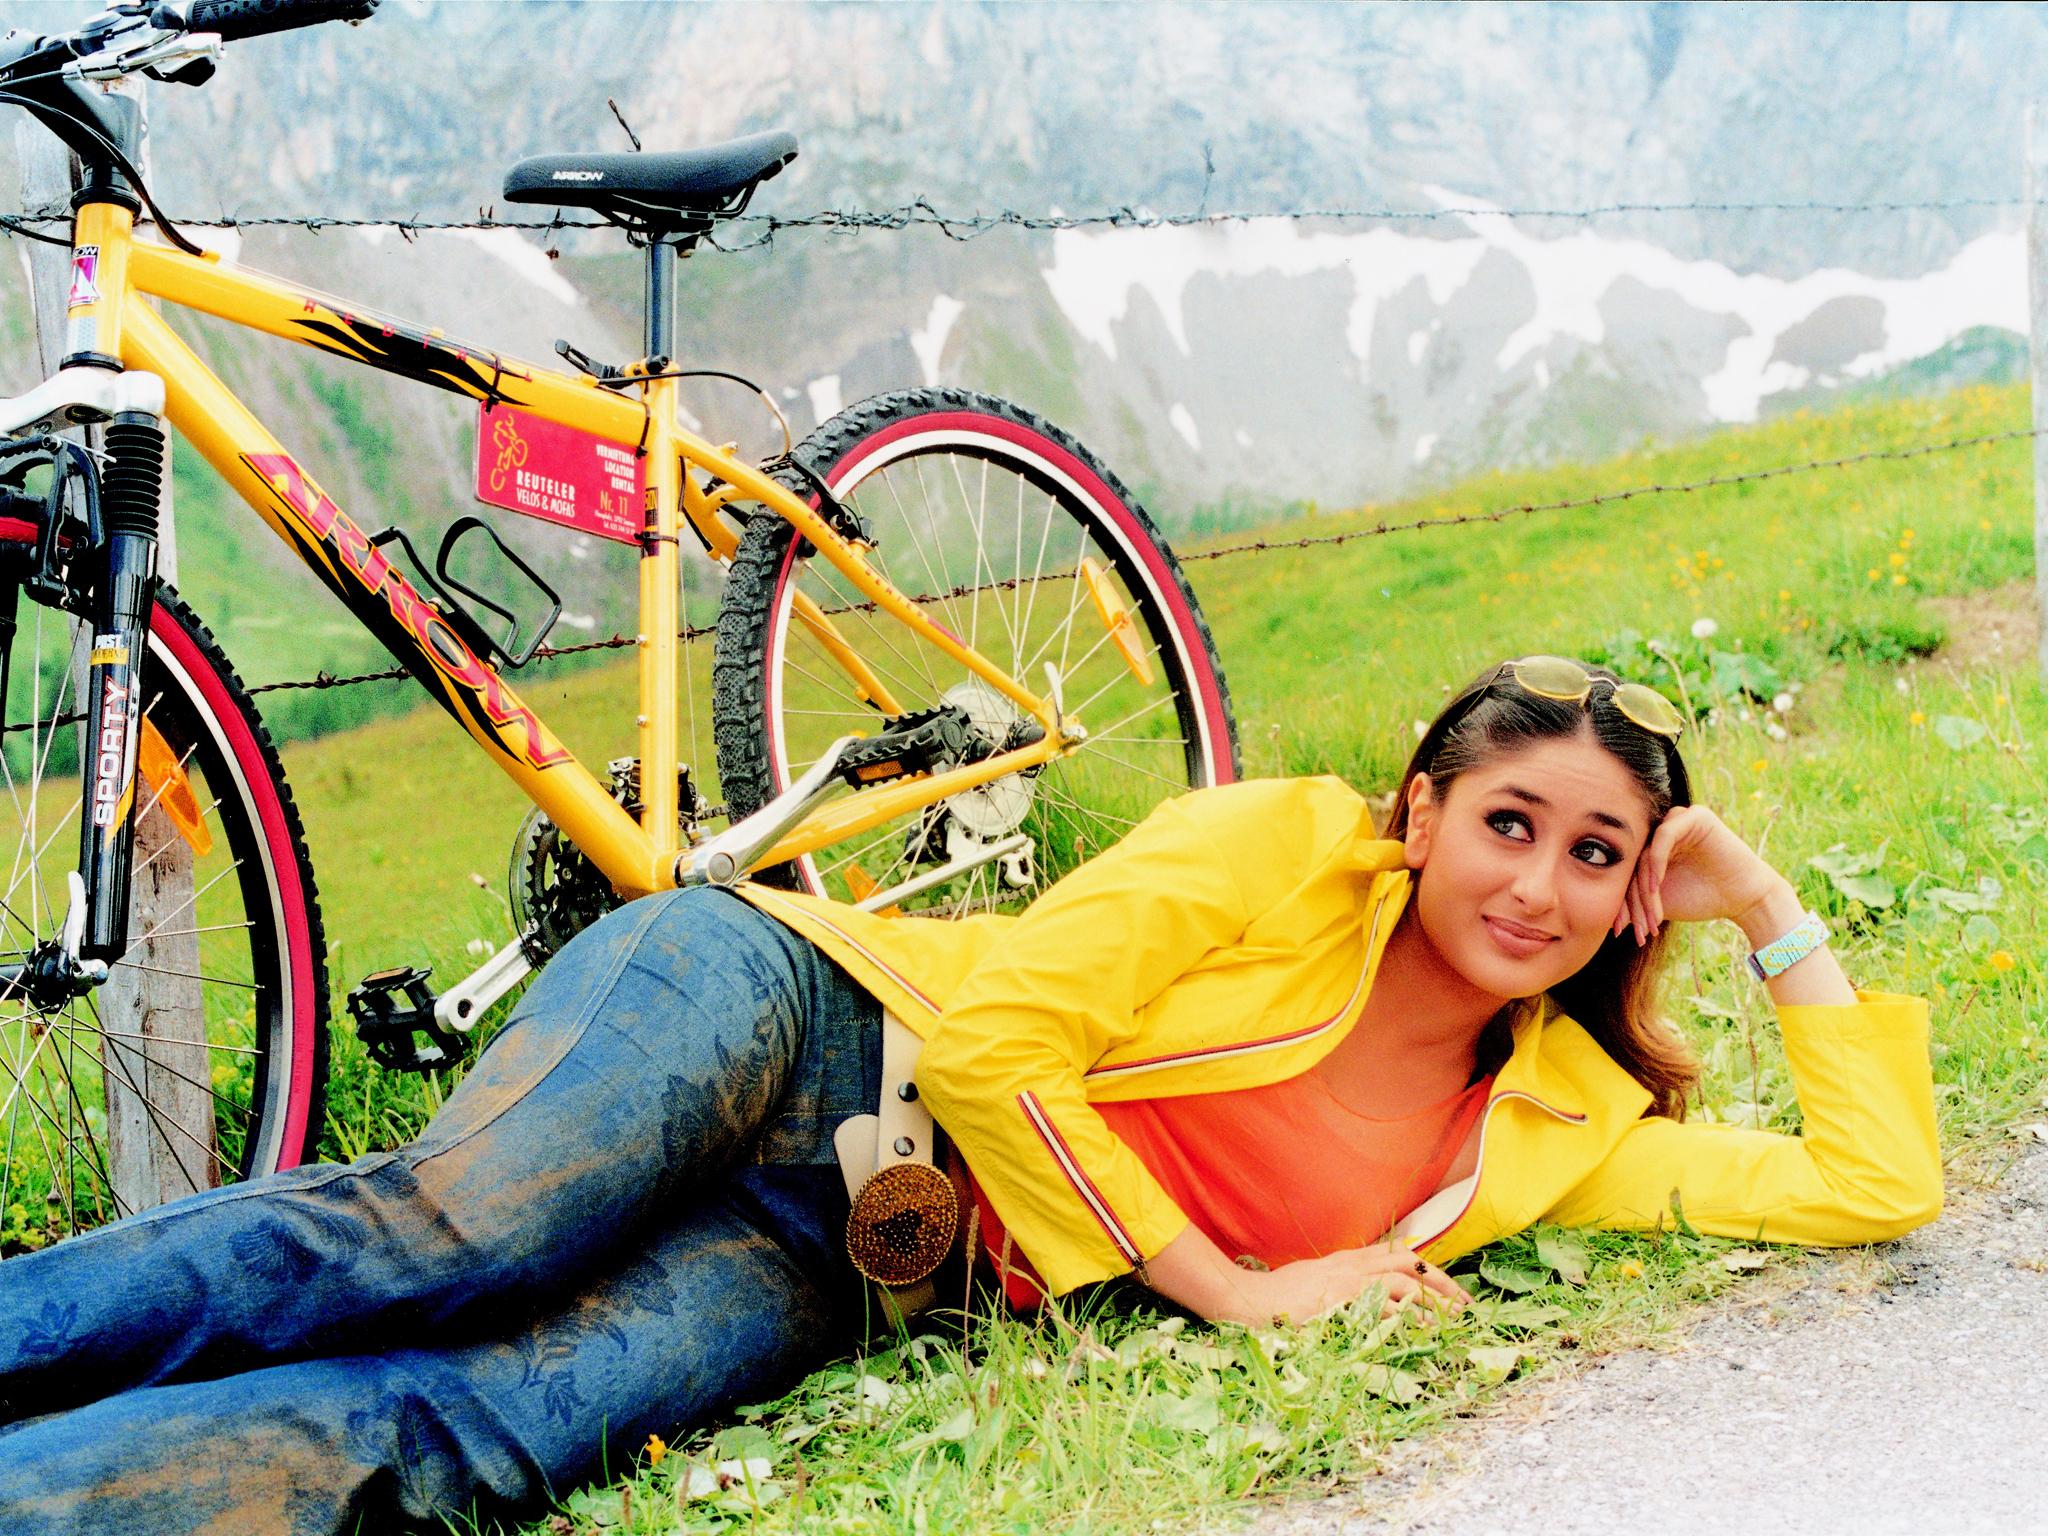 Style Evolution of Kareena Kapoor - Pre and Post Pregnancy - Mujhse Dosti Karoge